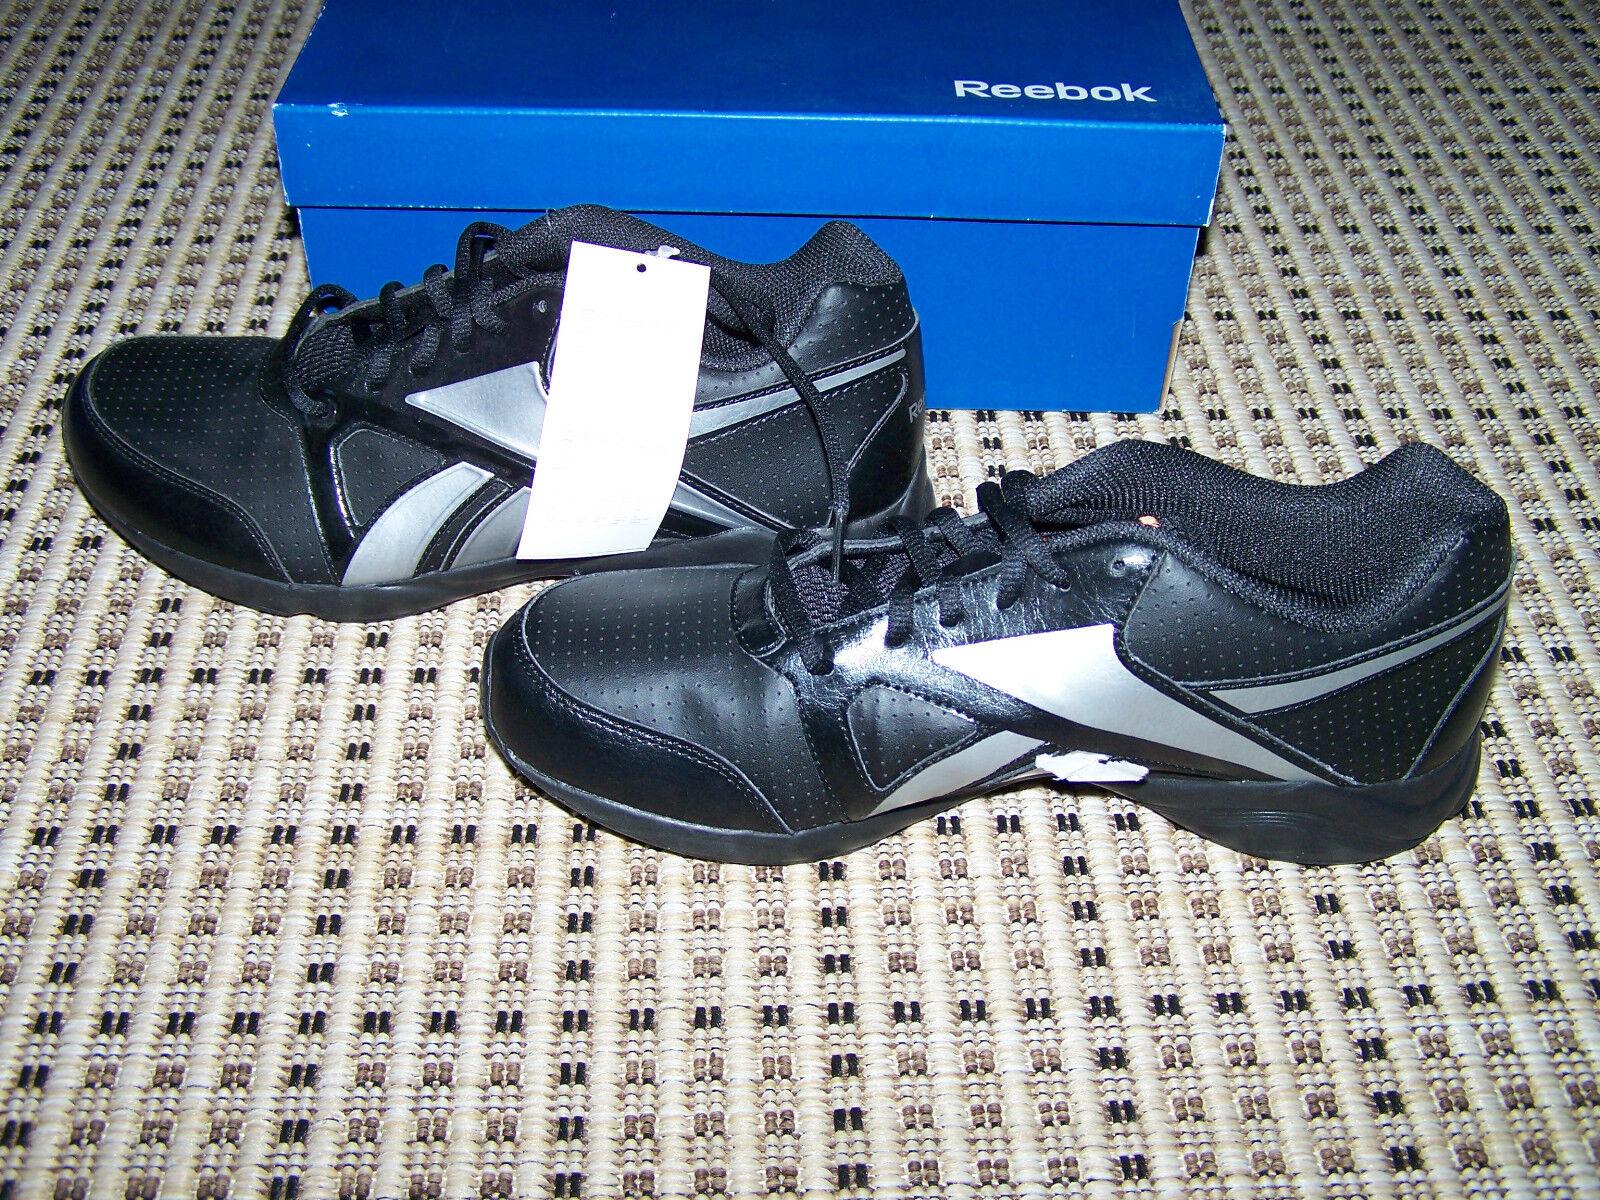 Reebok Reesculpt Trainer II Damen Schuh in Gr. 40 schwarz NEU